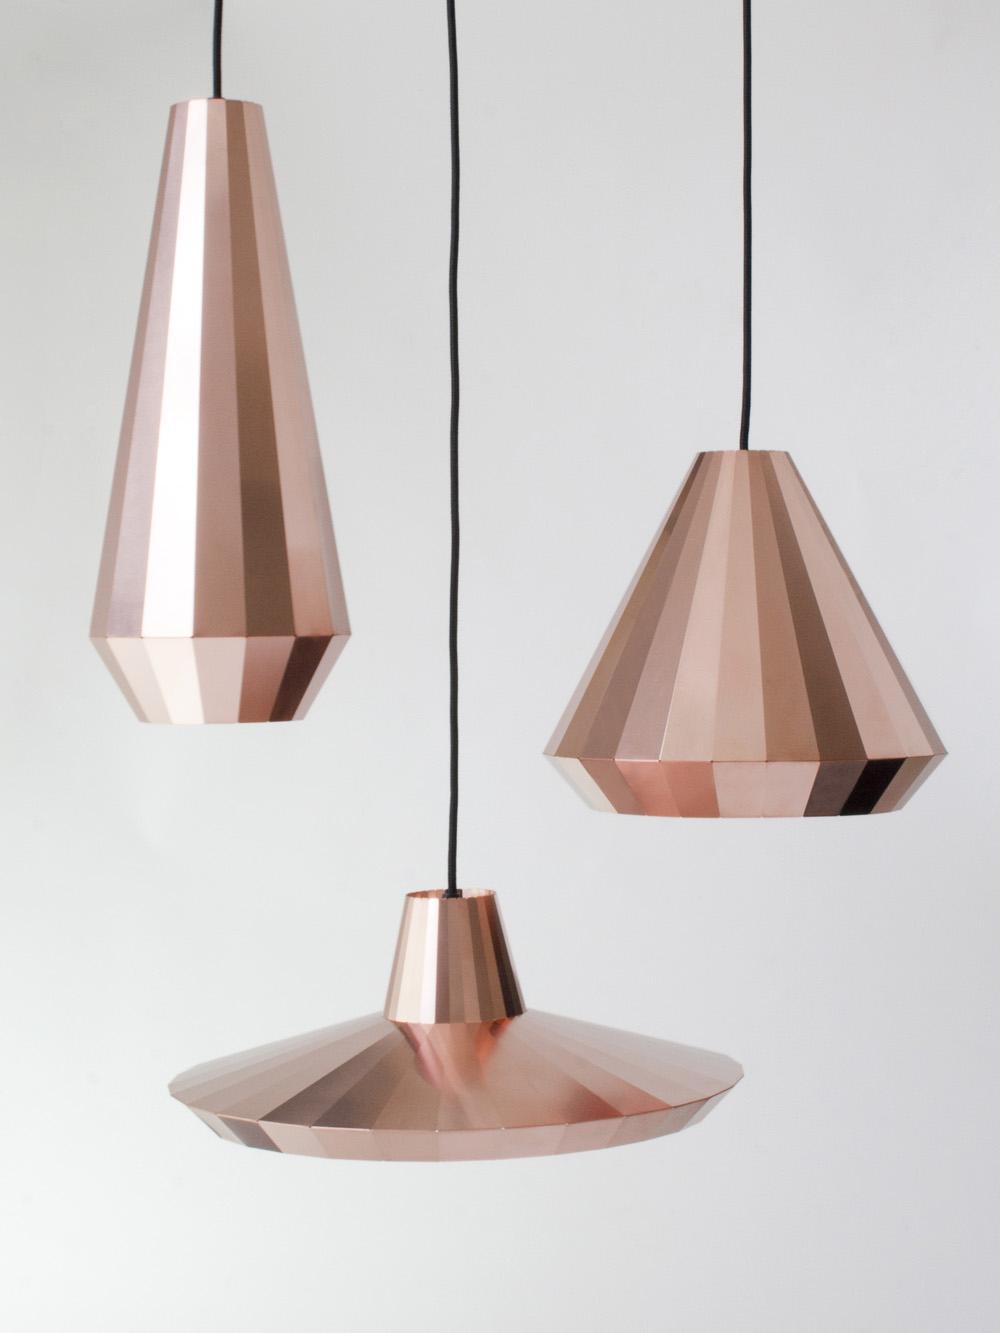 Vij5-Copper-Lights-02-2014-image-by-David-Derksen-Design RS.jpg